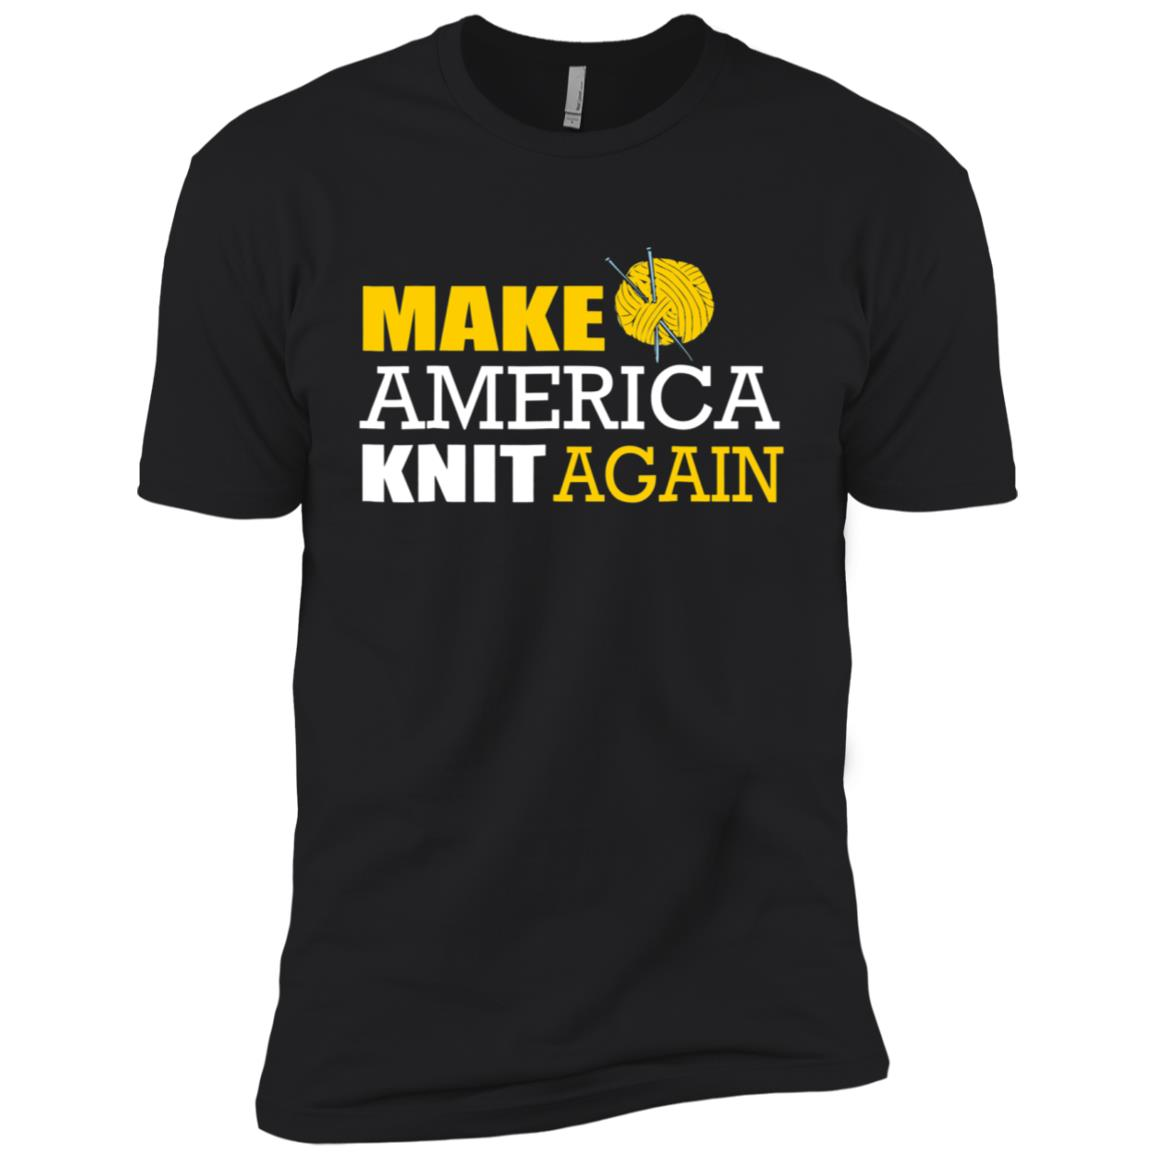 Make America Knit Again Funny Knitting Tee Men Short Sleeve T-Shirt